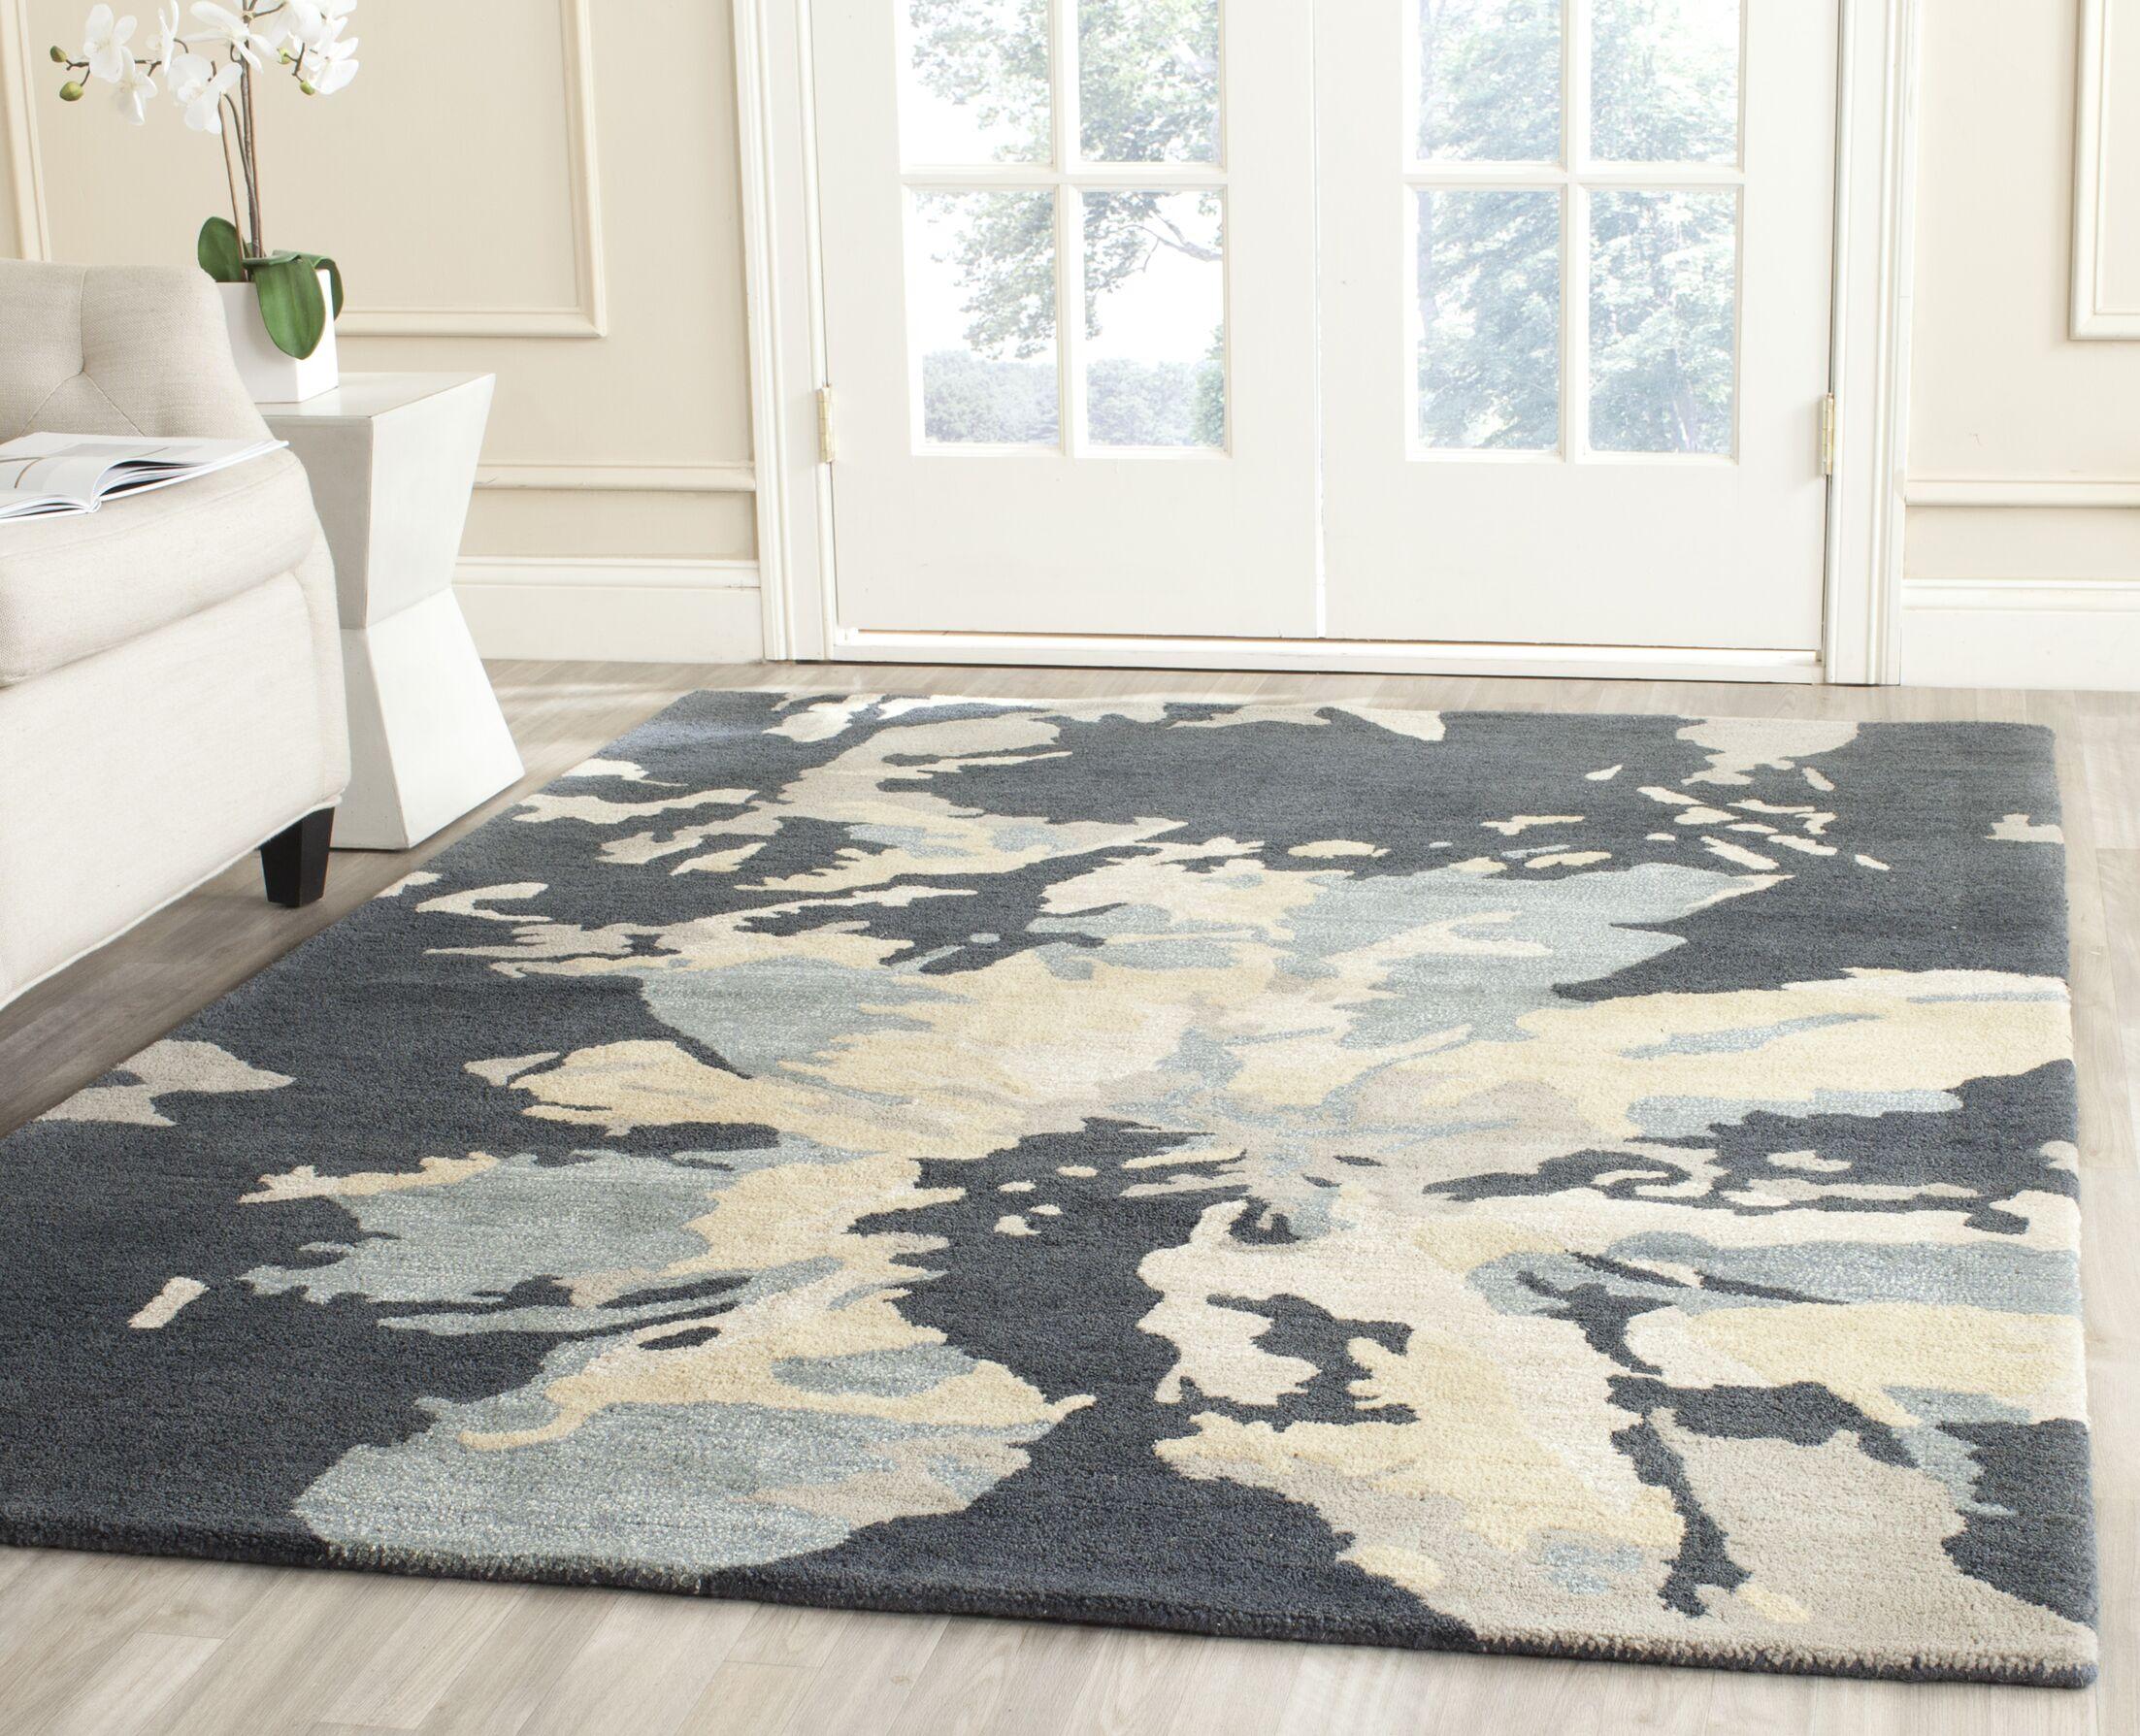 Adan Steel Blue Area Rug Rug Size: Rectangle 8' x 10'